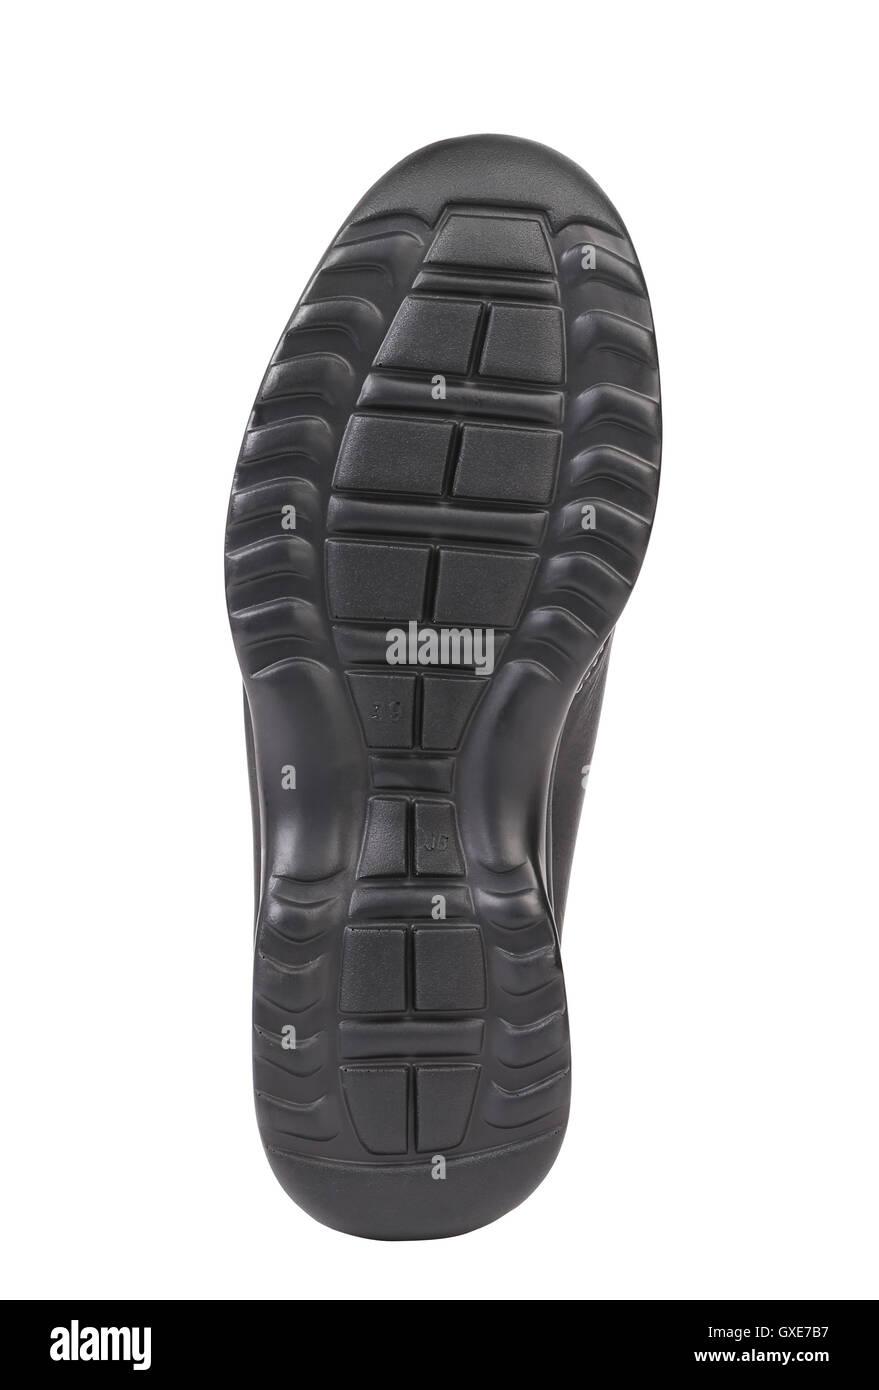 Black shoe soles. - Stock Image